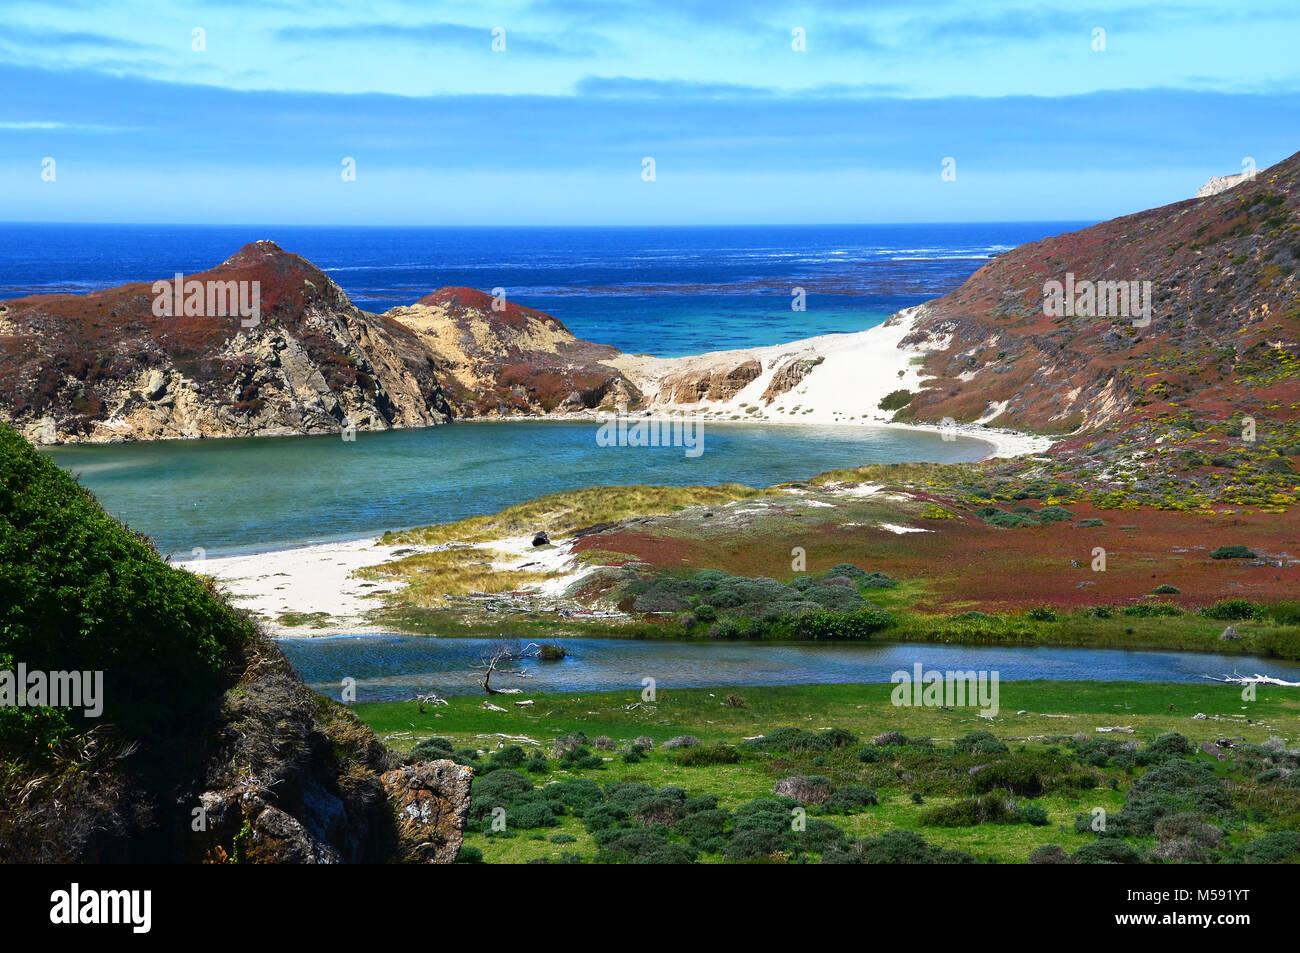 Little Sur River on the Big Sur coast of California - Stock Image